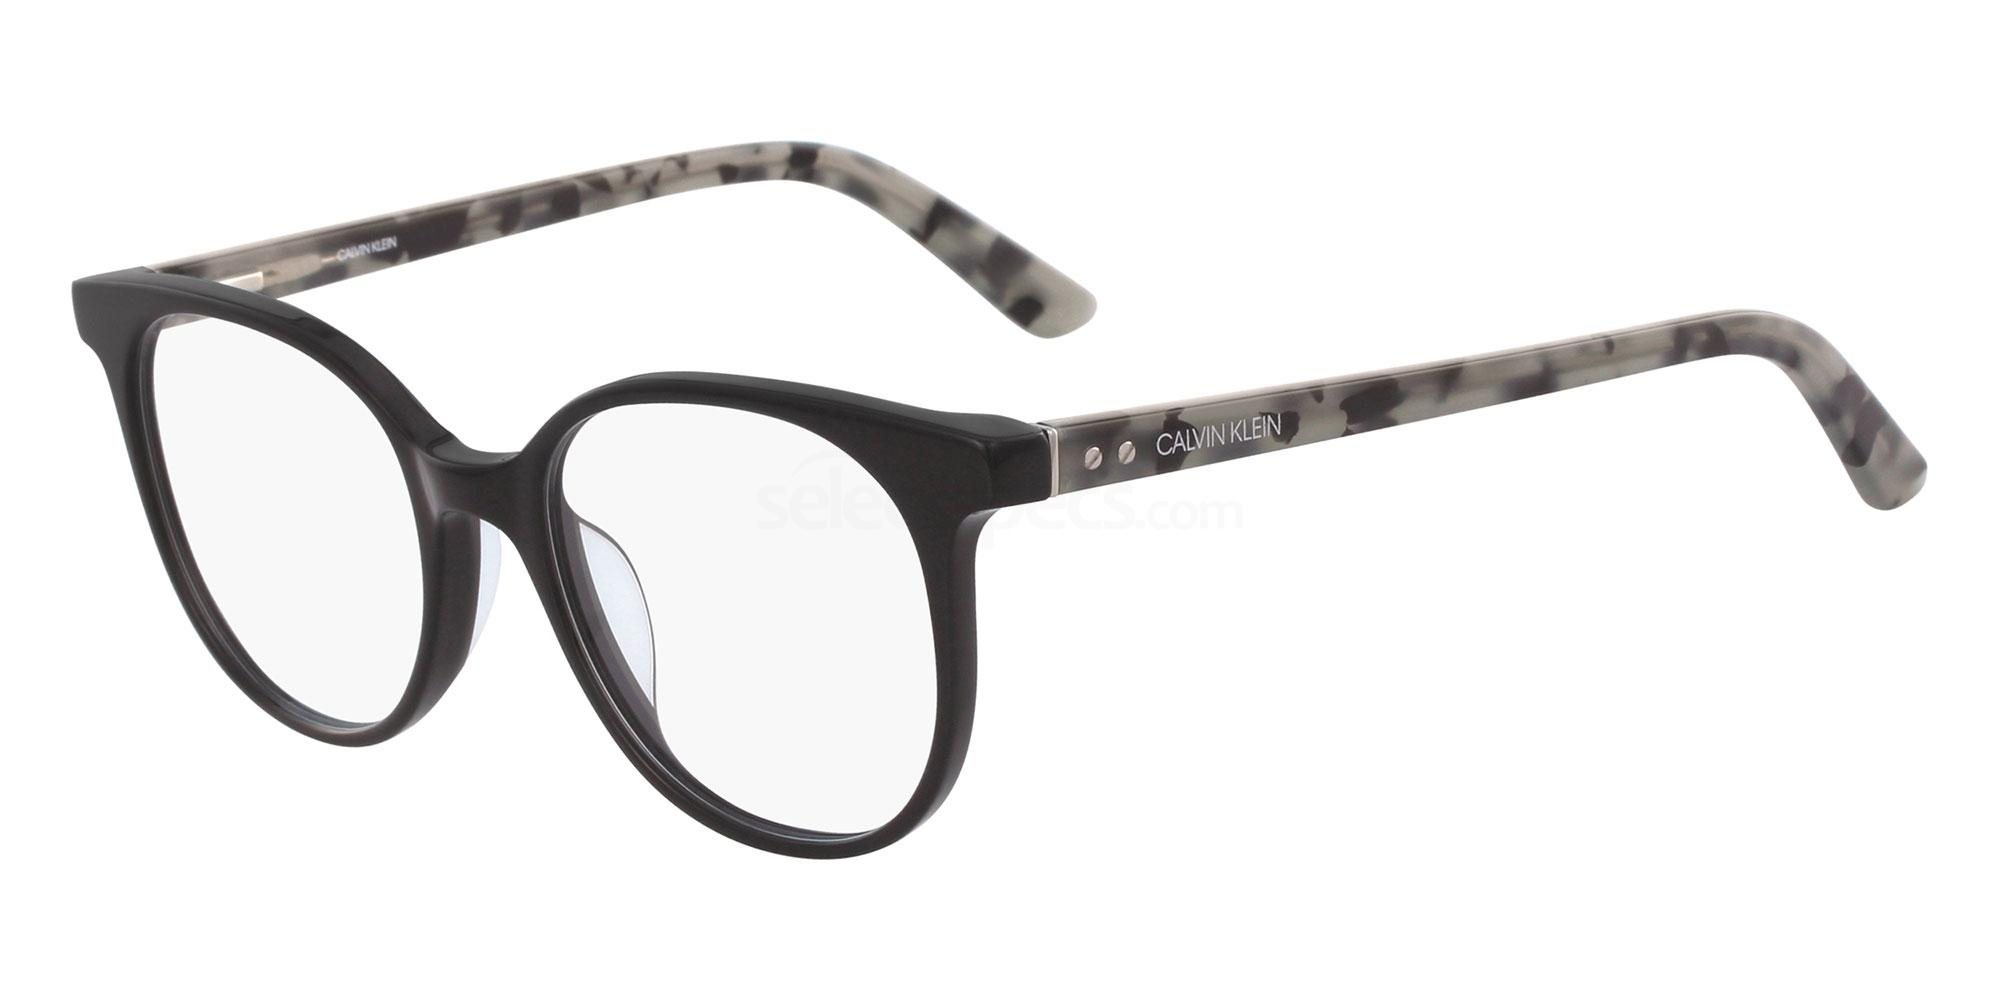 001 CK18538 Glasses, Calvin Klein